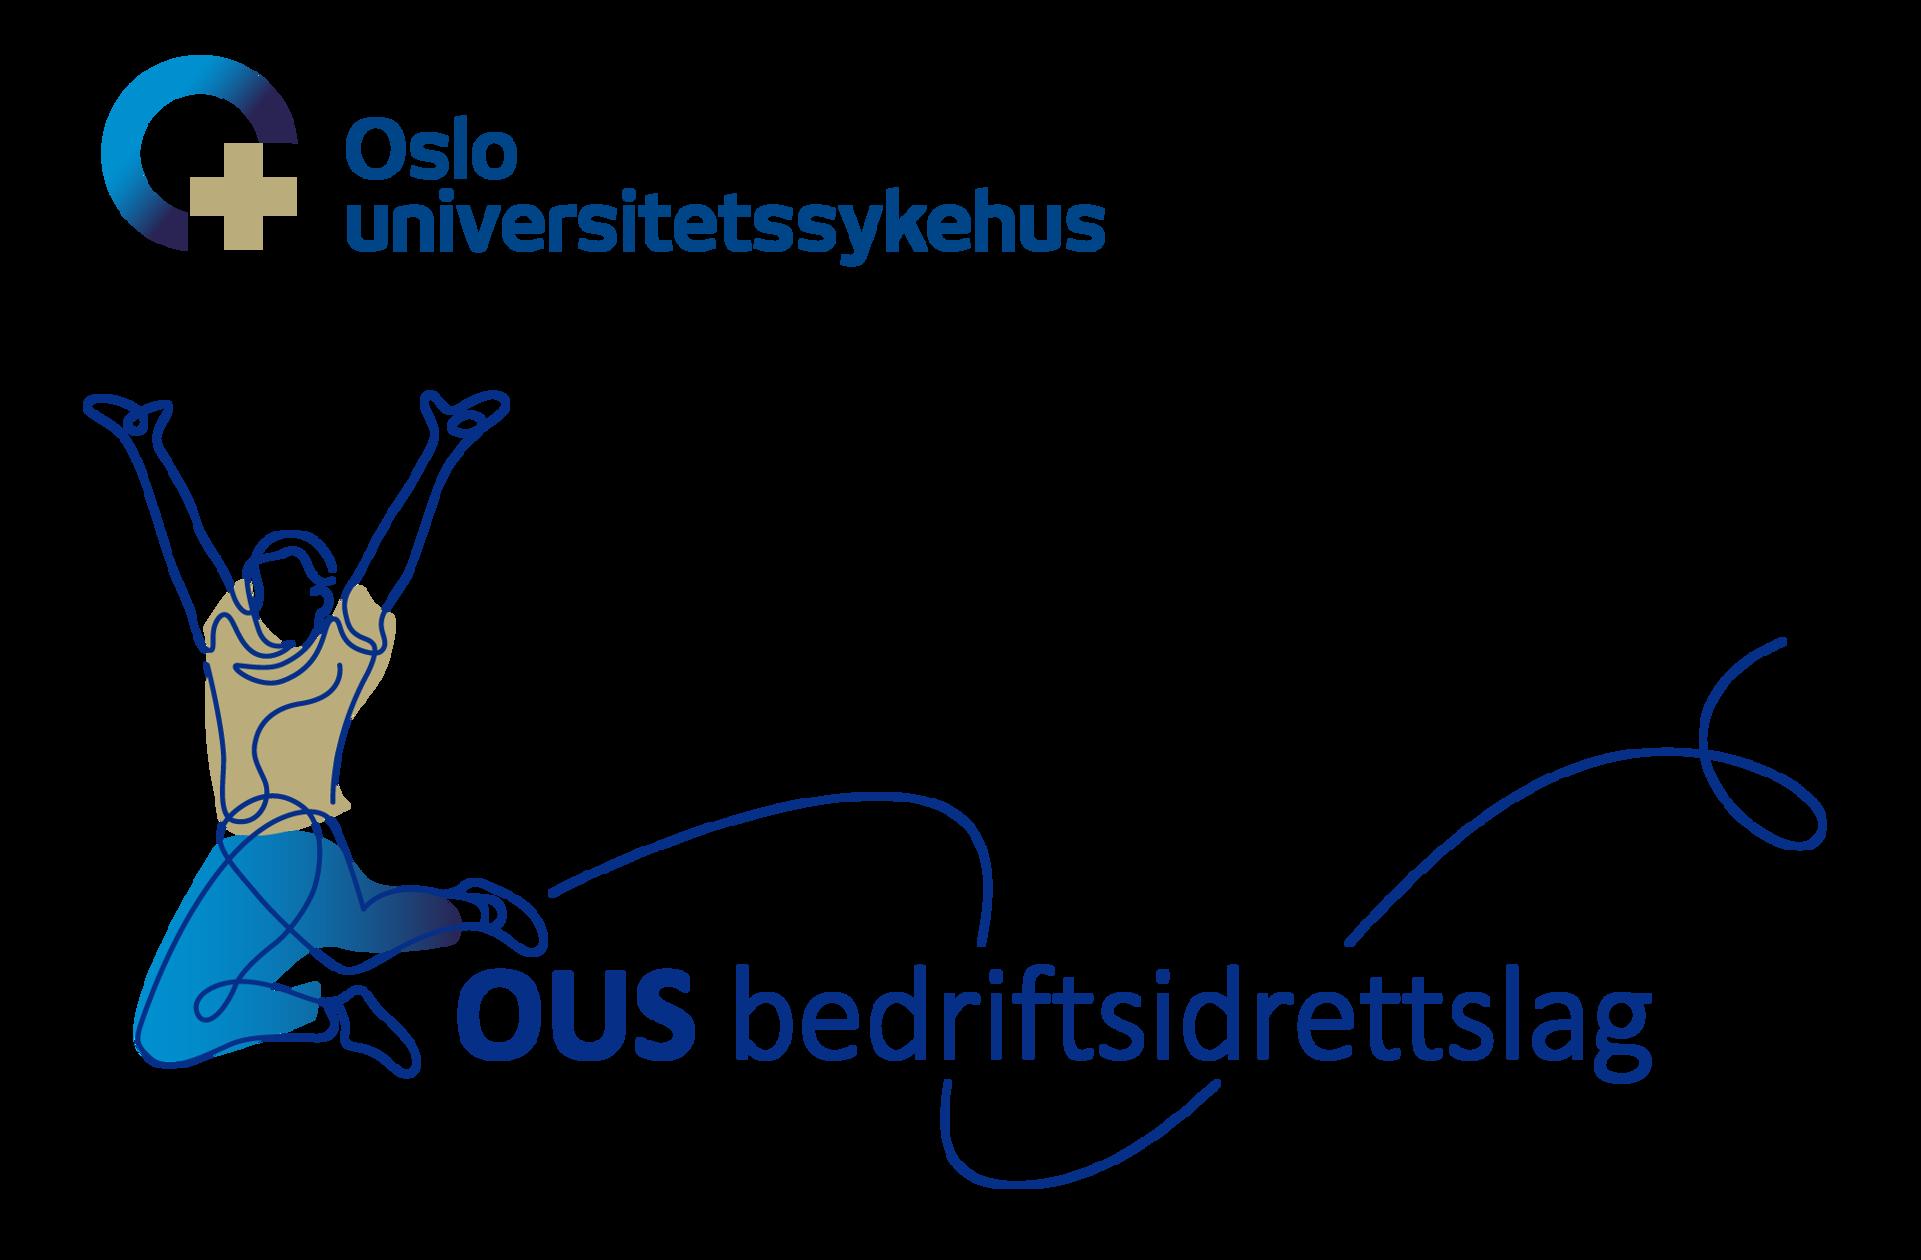 OUS_bedriftsidretslag_farger_rgb.png